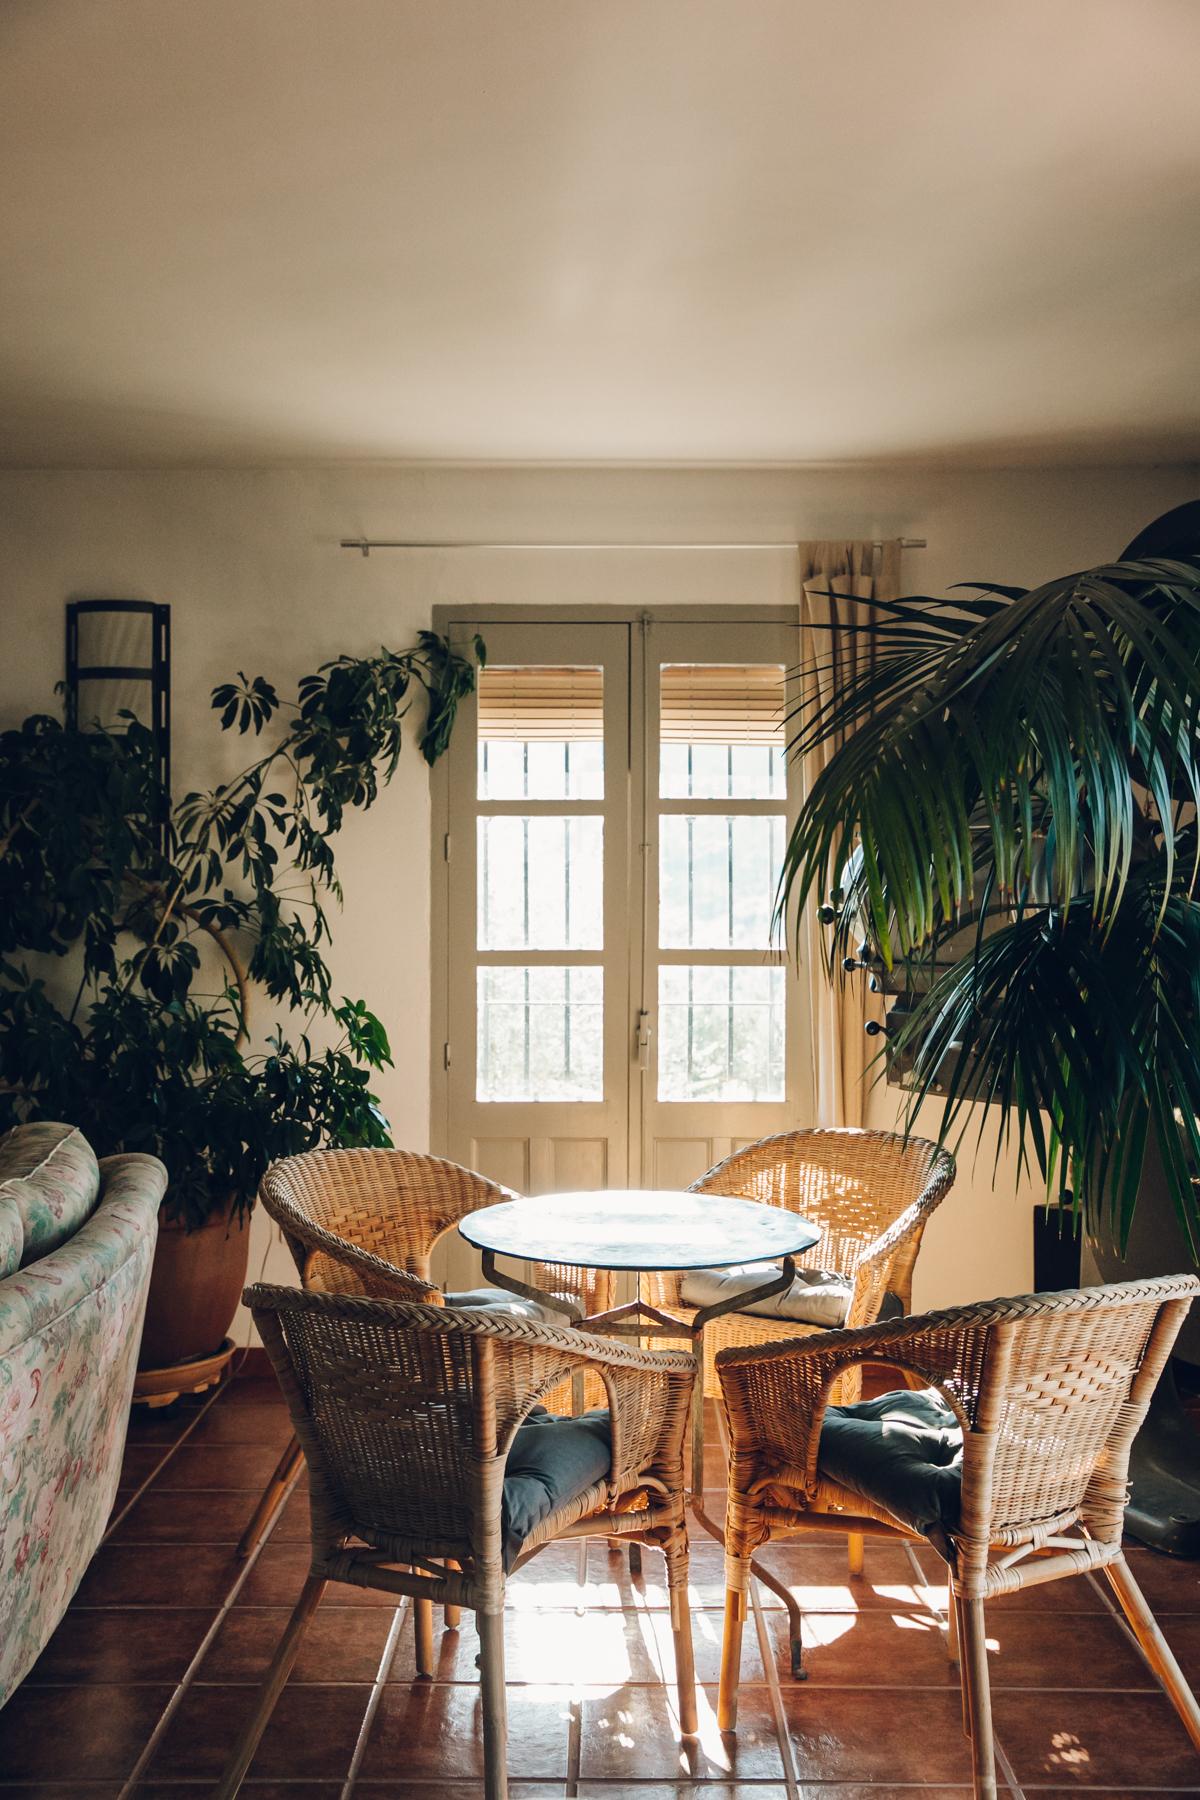 Spanish interior details - with houseplants.